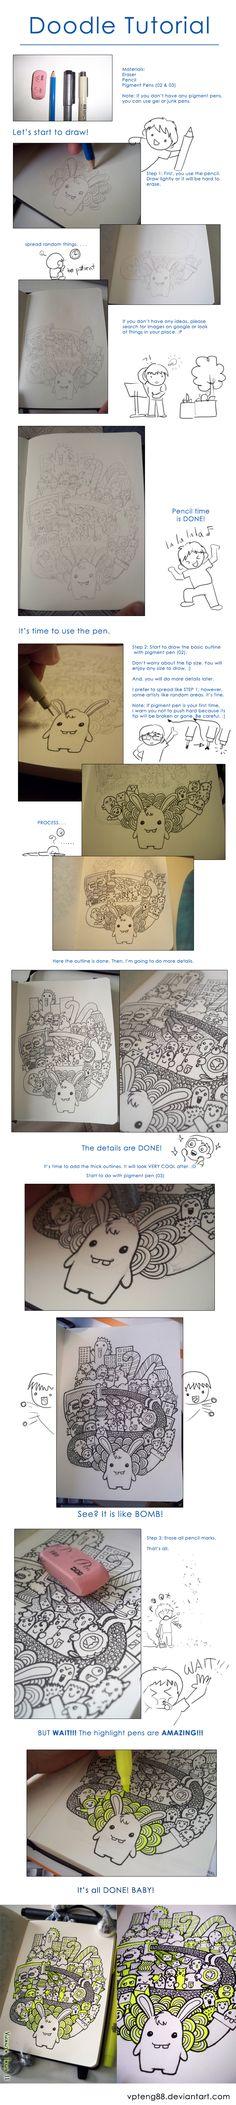 Doodle Tutorial by vicenteteng.deviantart.com on @deviantART | nice tutorial!